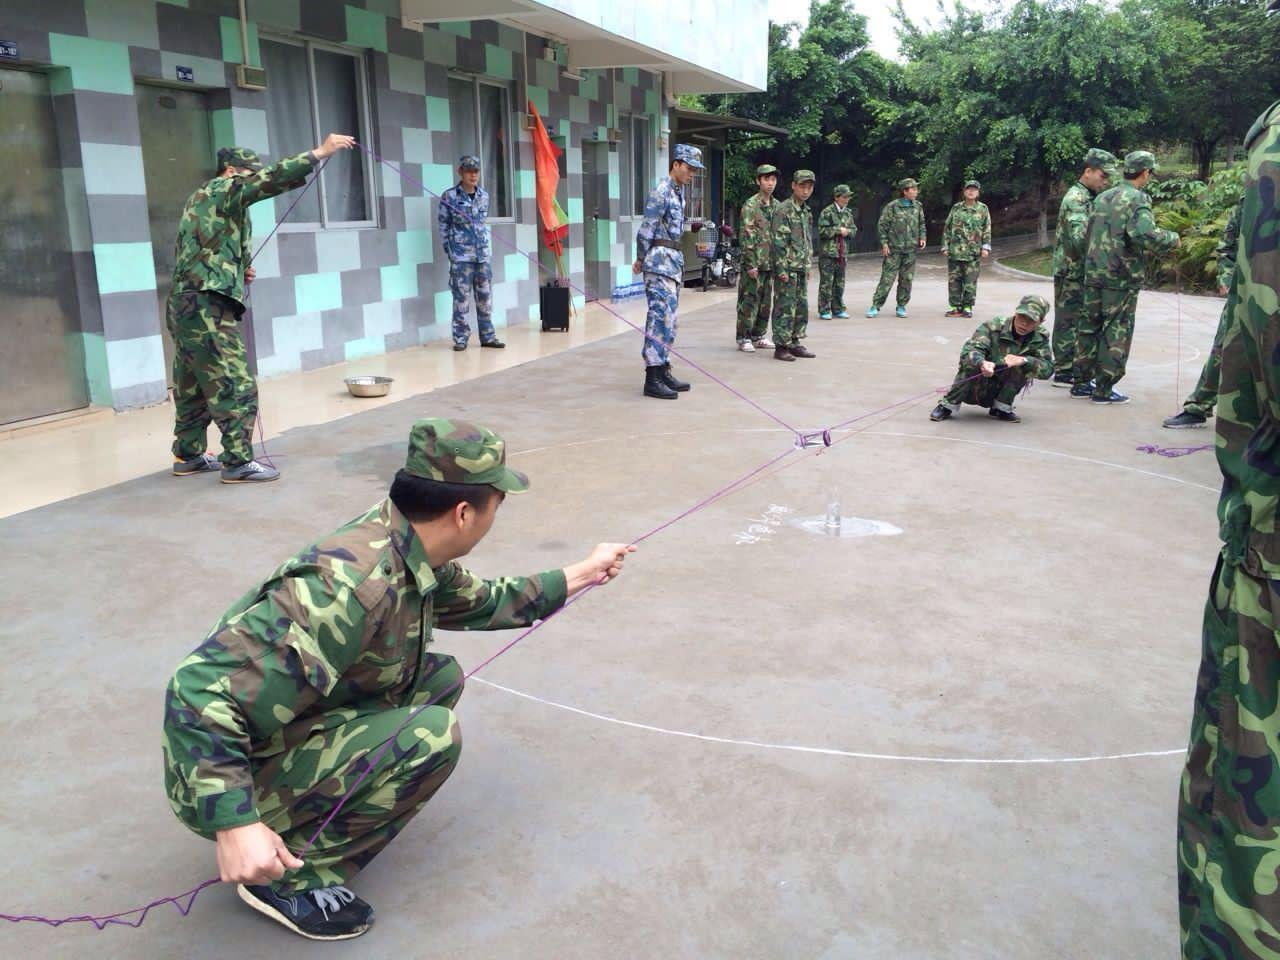 news-WINPAI-Ying Jia Baili, Ying Ying to join the Whampoa Military Academy of military training-img